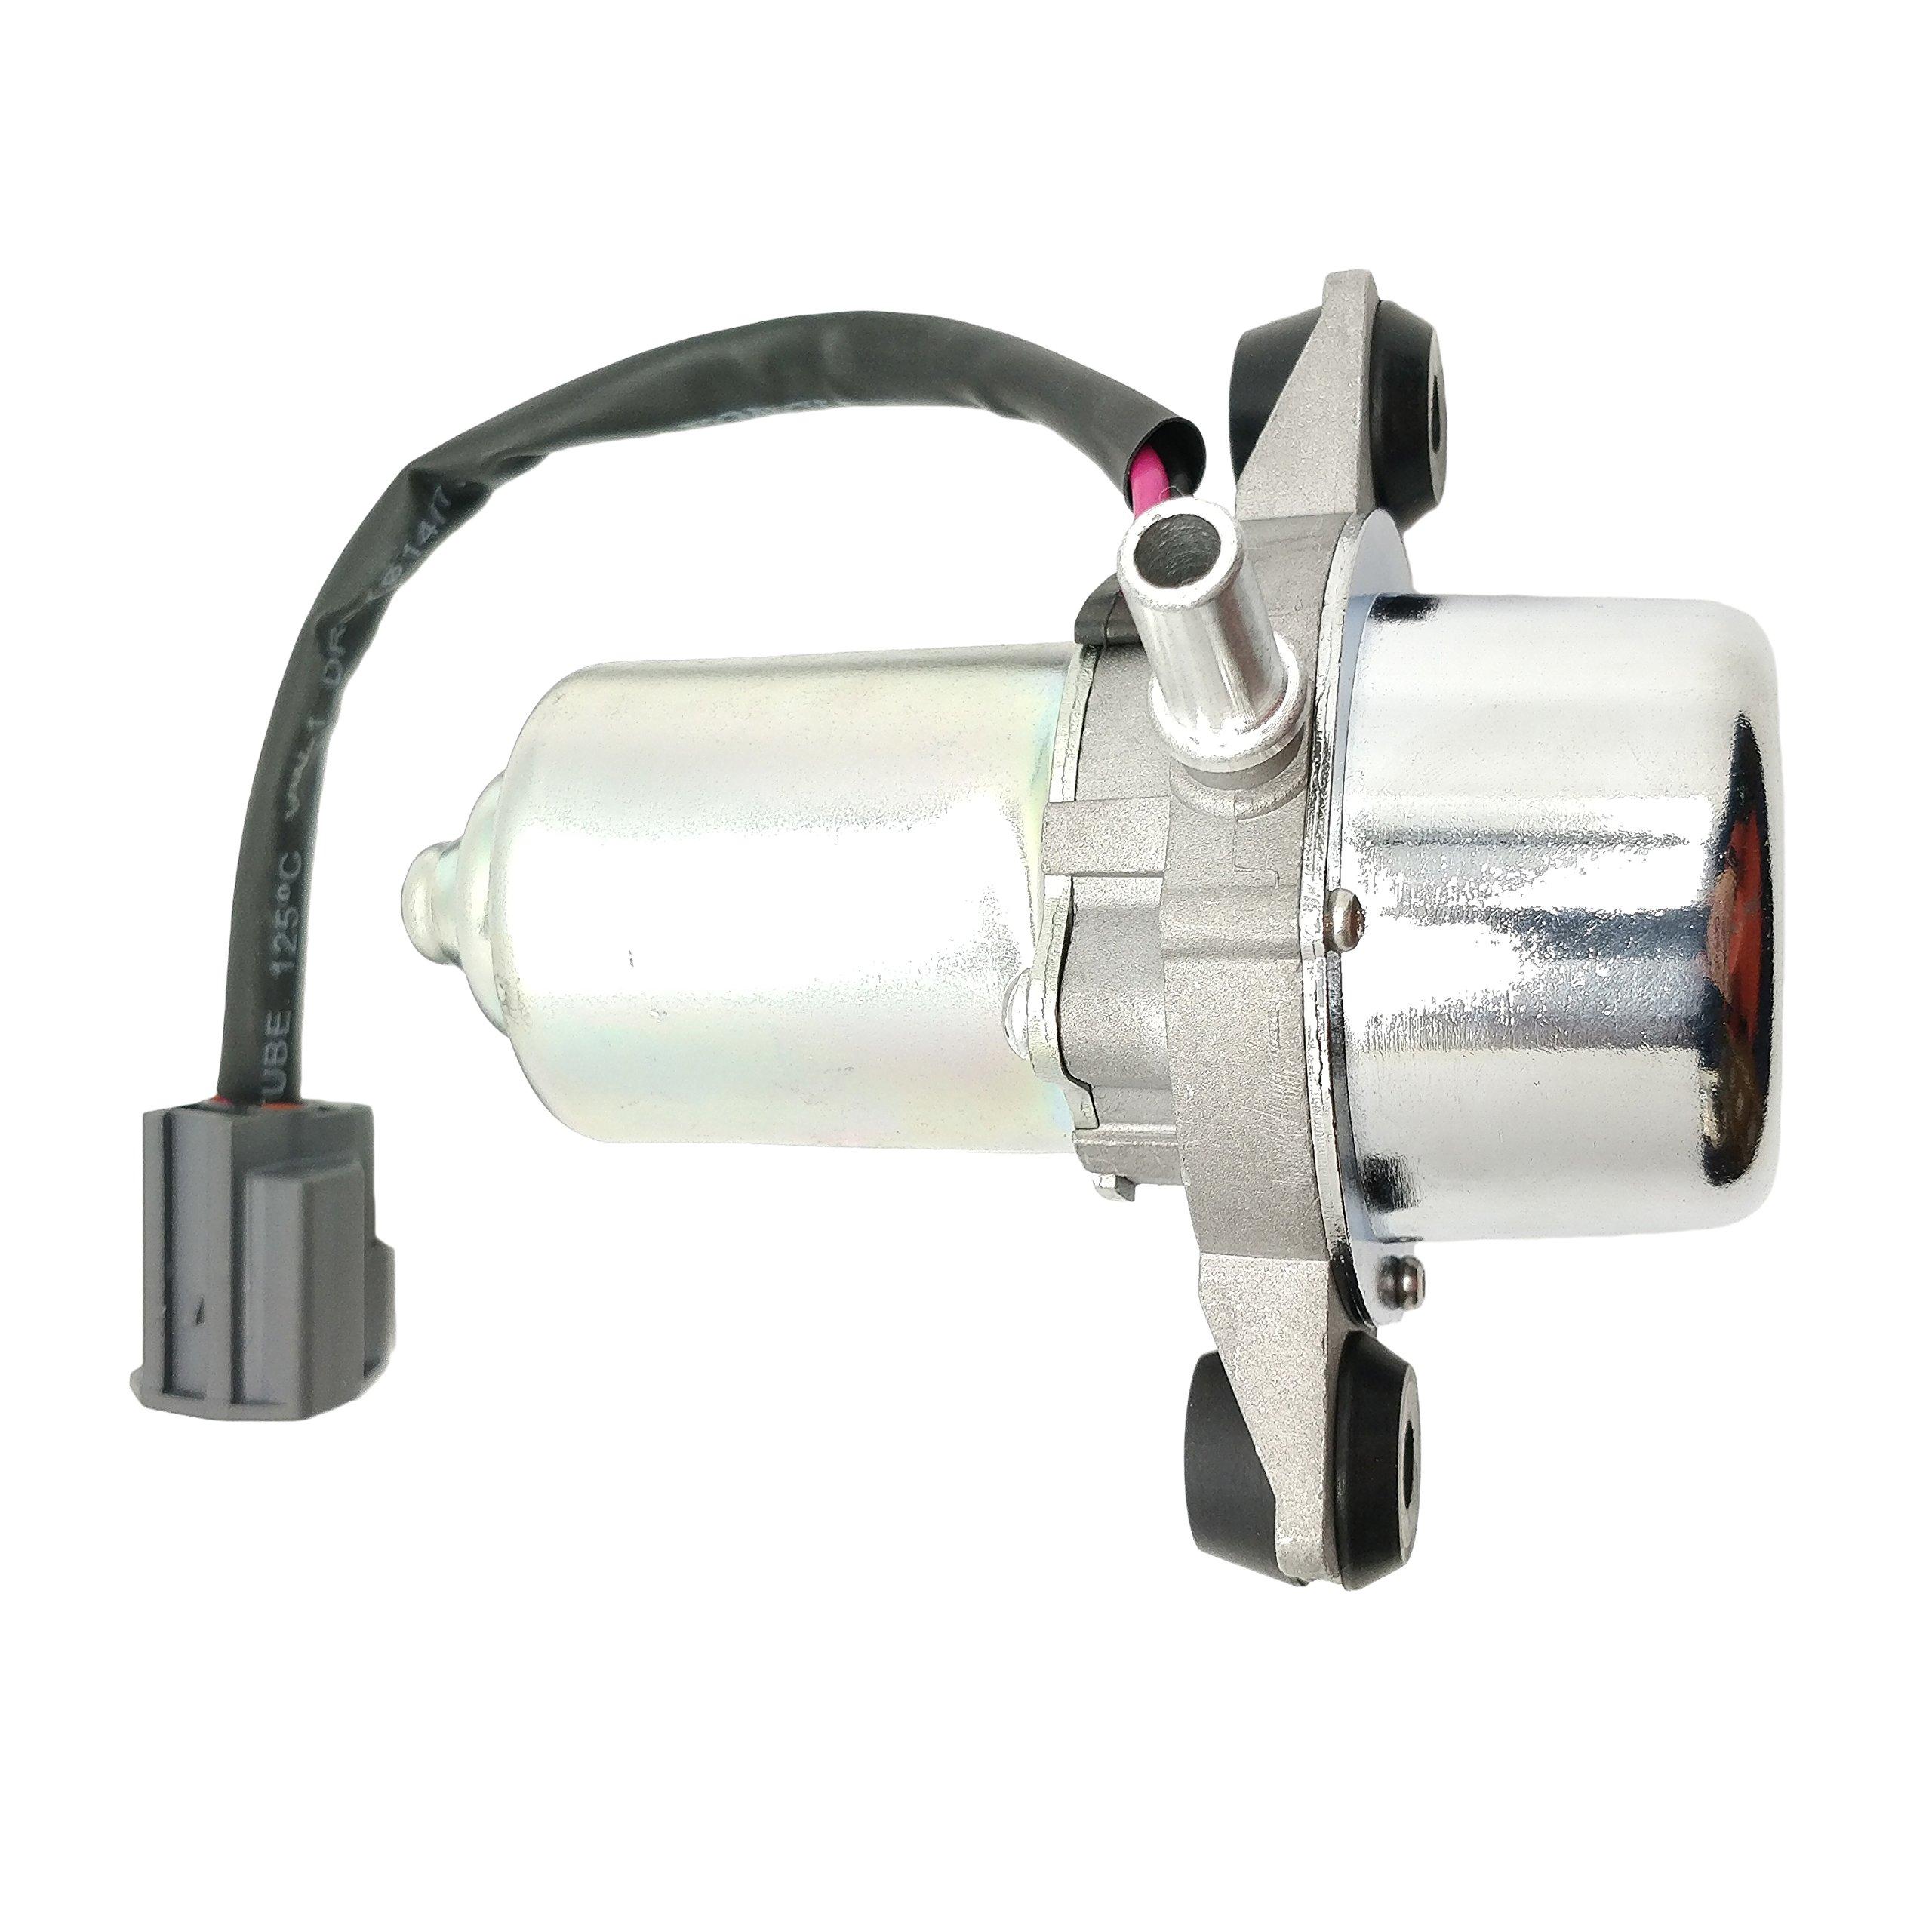 FOR Volvo C70 S60 S80 V50 V70 XC70 XC90 Brake Vacuum Pump 30630398